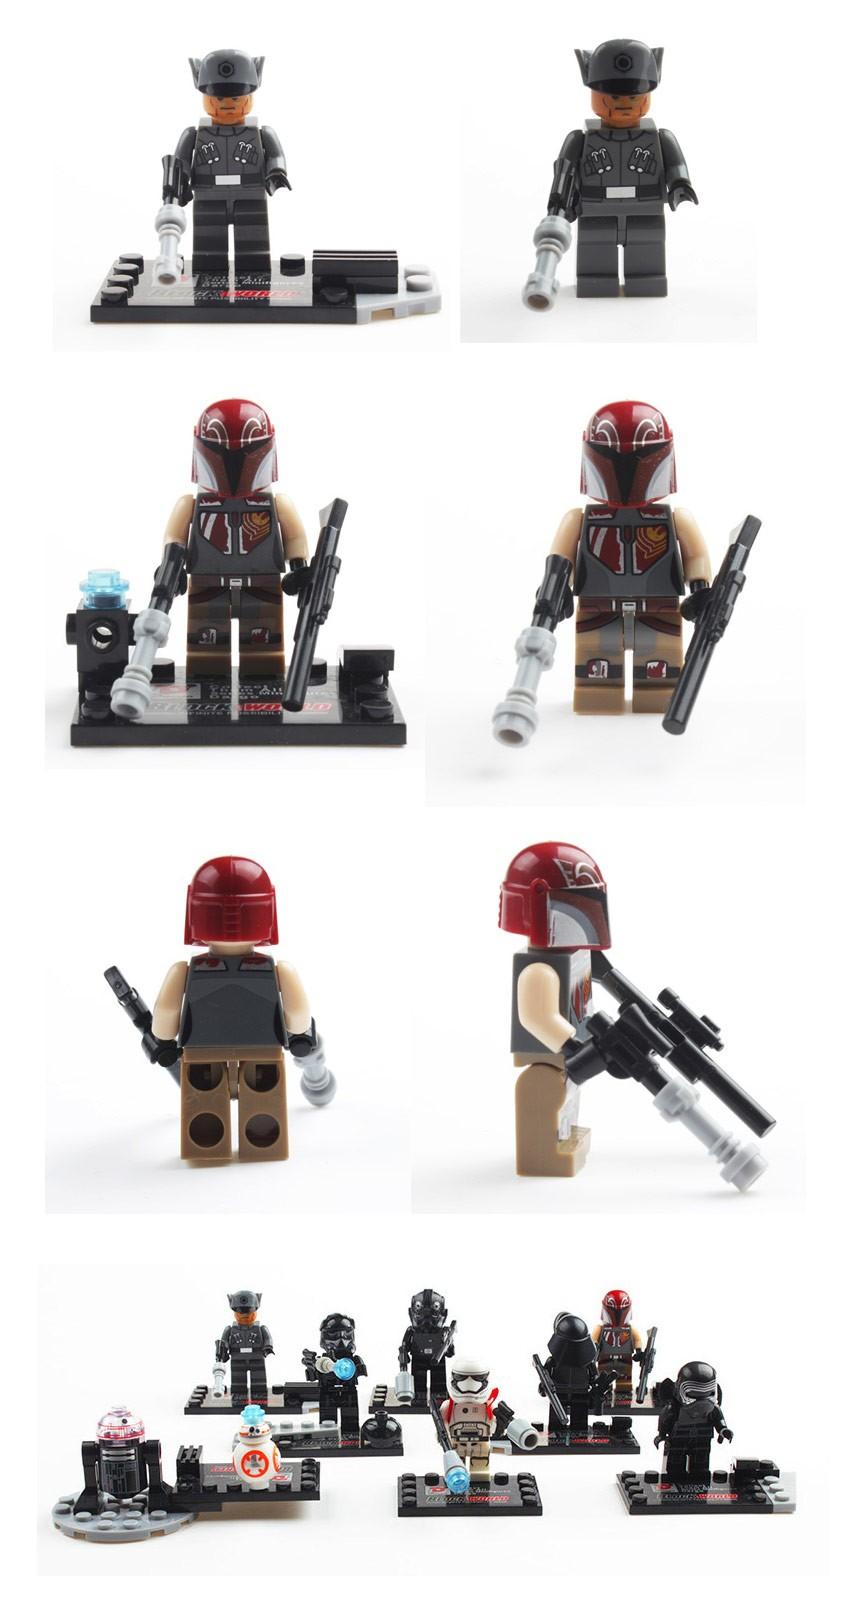 1Pcs Star Wars 7 Minifigures The Power Awakens Kylo Ren TIE Pilot Constructing Block Fashions Figures Toys For Kids